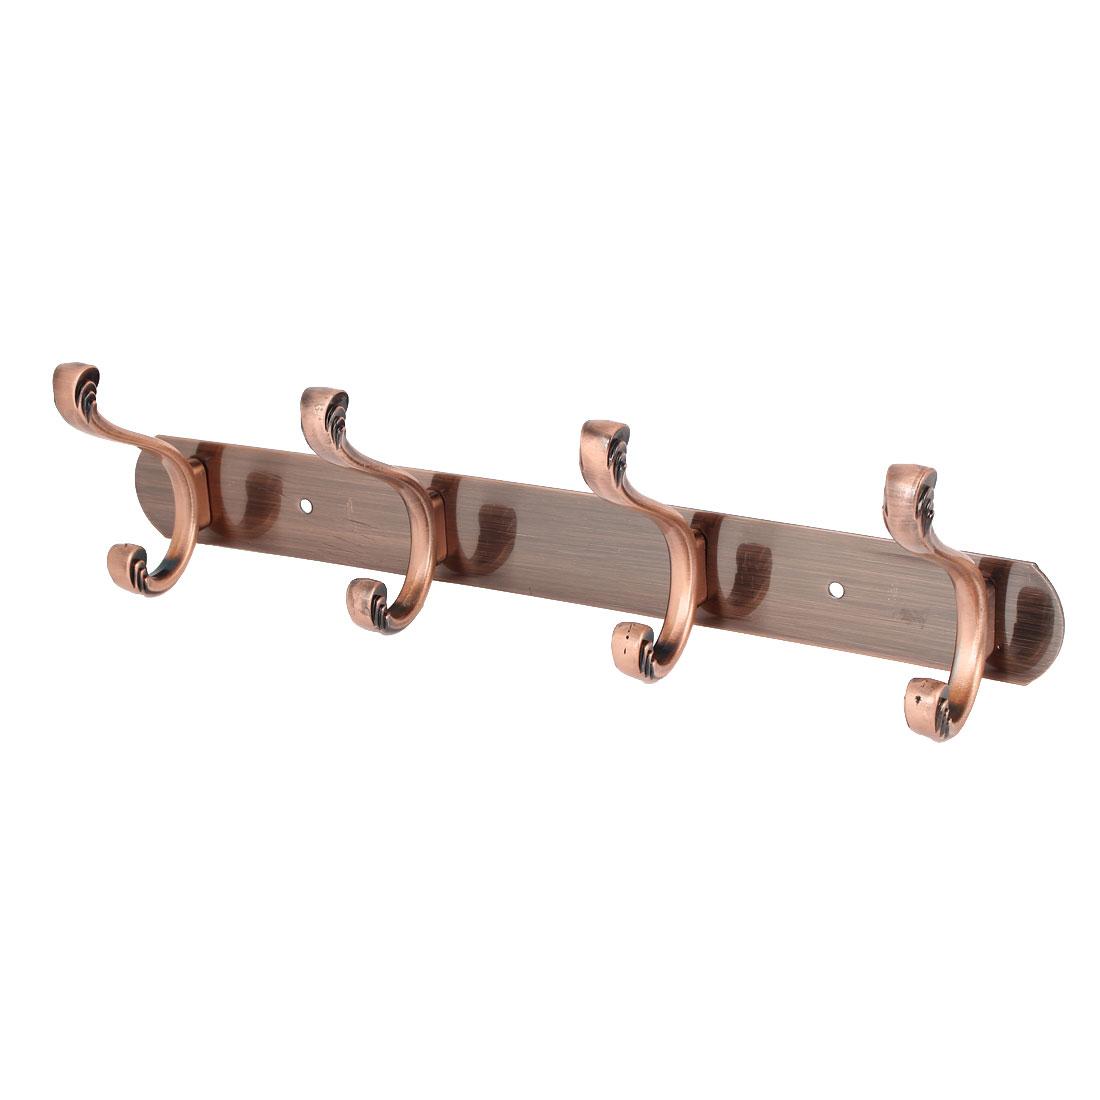 Clothes Towel Hanging Metal Rail Bar 4 Double Hook Wall Hanger Copper Tone 350x40x2mm